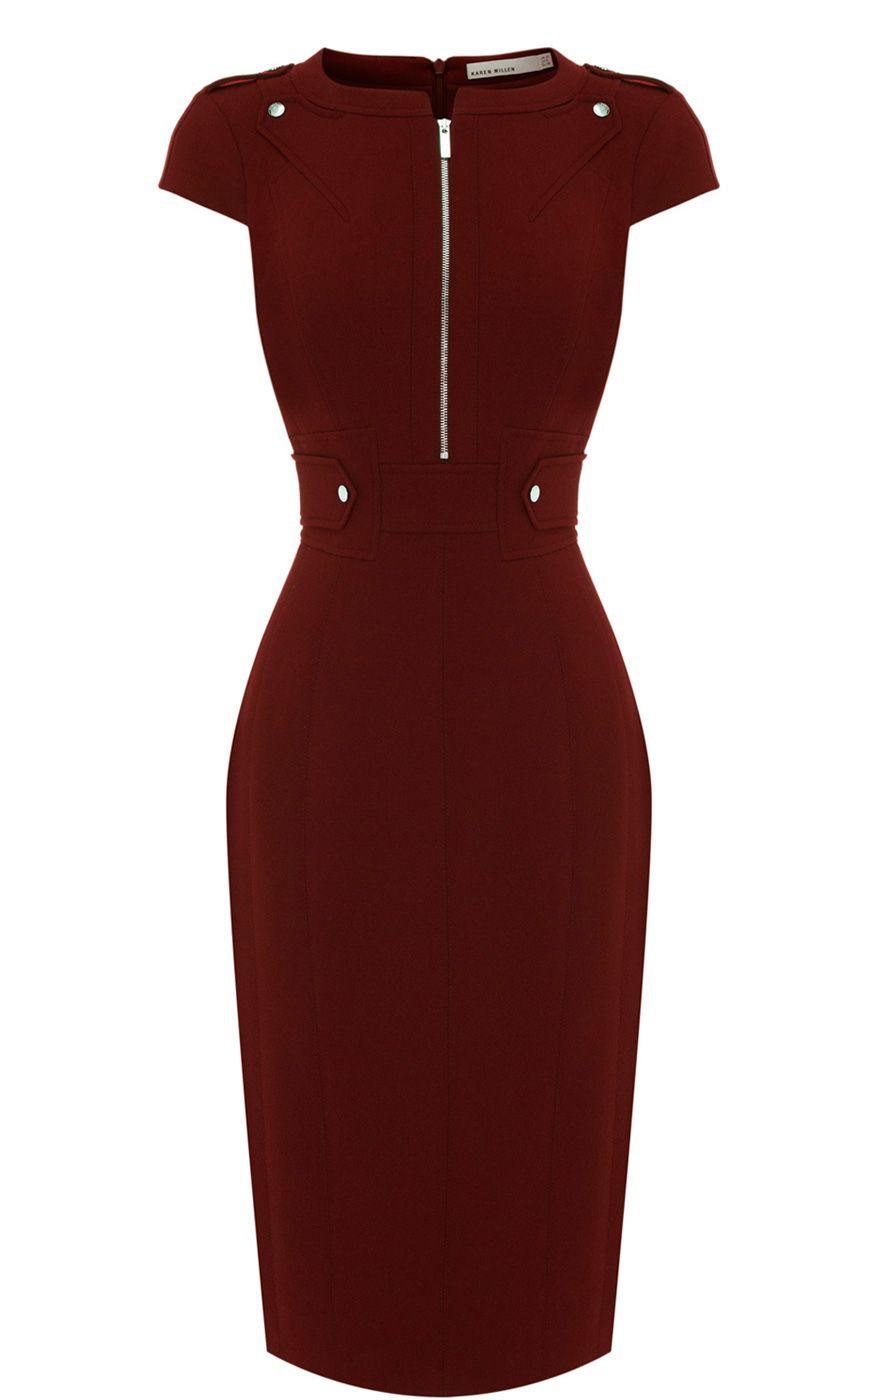 502771c71058 Karen Millen Military tailored dress   I Love Fashion   Dresses ...